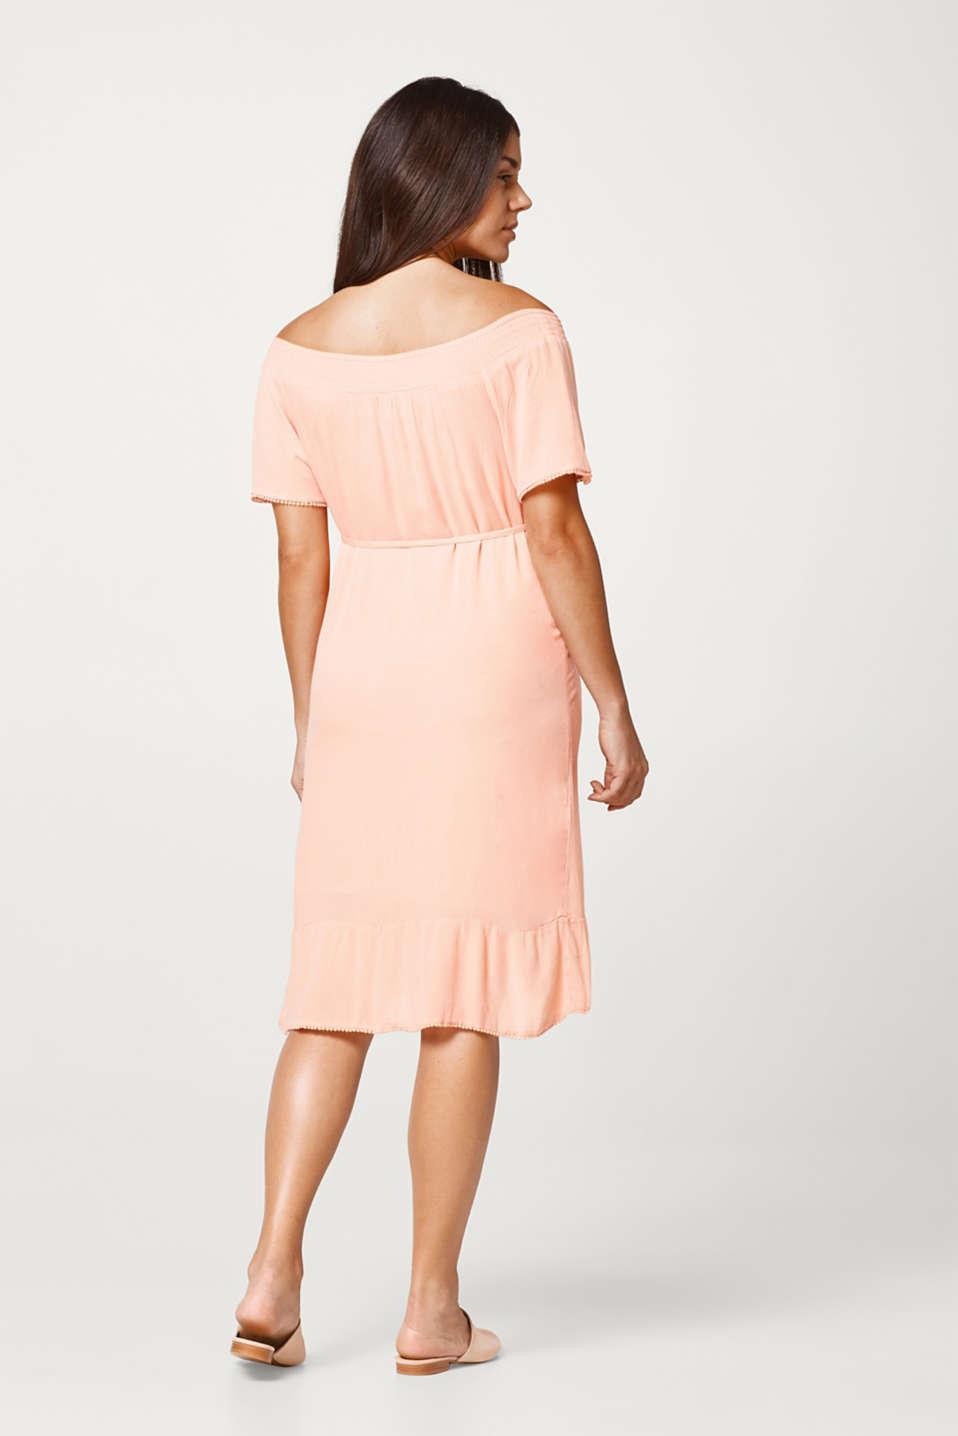 Flowing crinkle dress with dainty borders, LCROSE BRICK, detail image number 3